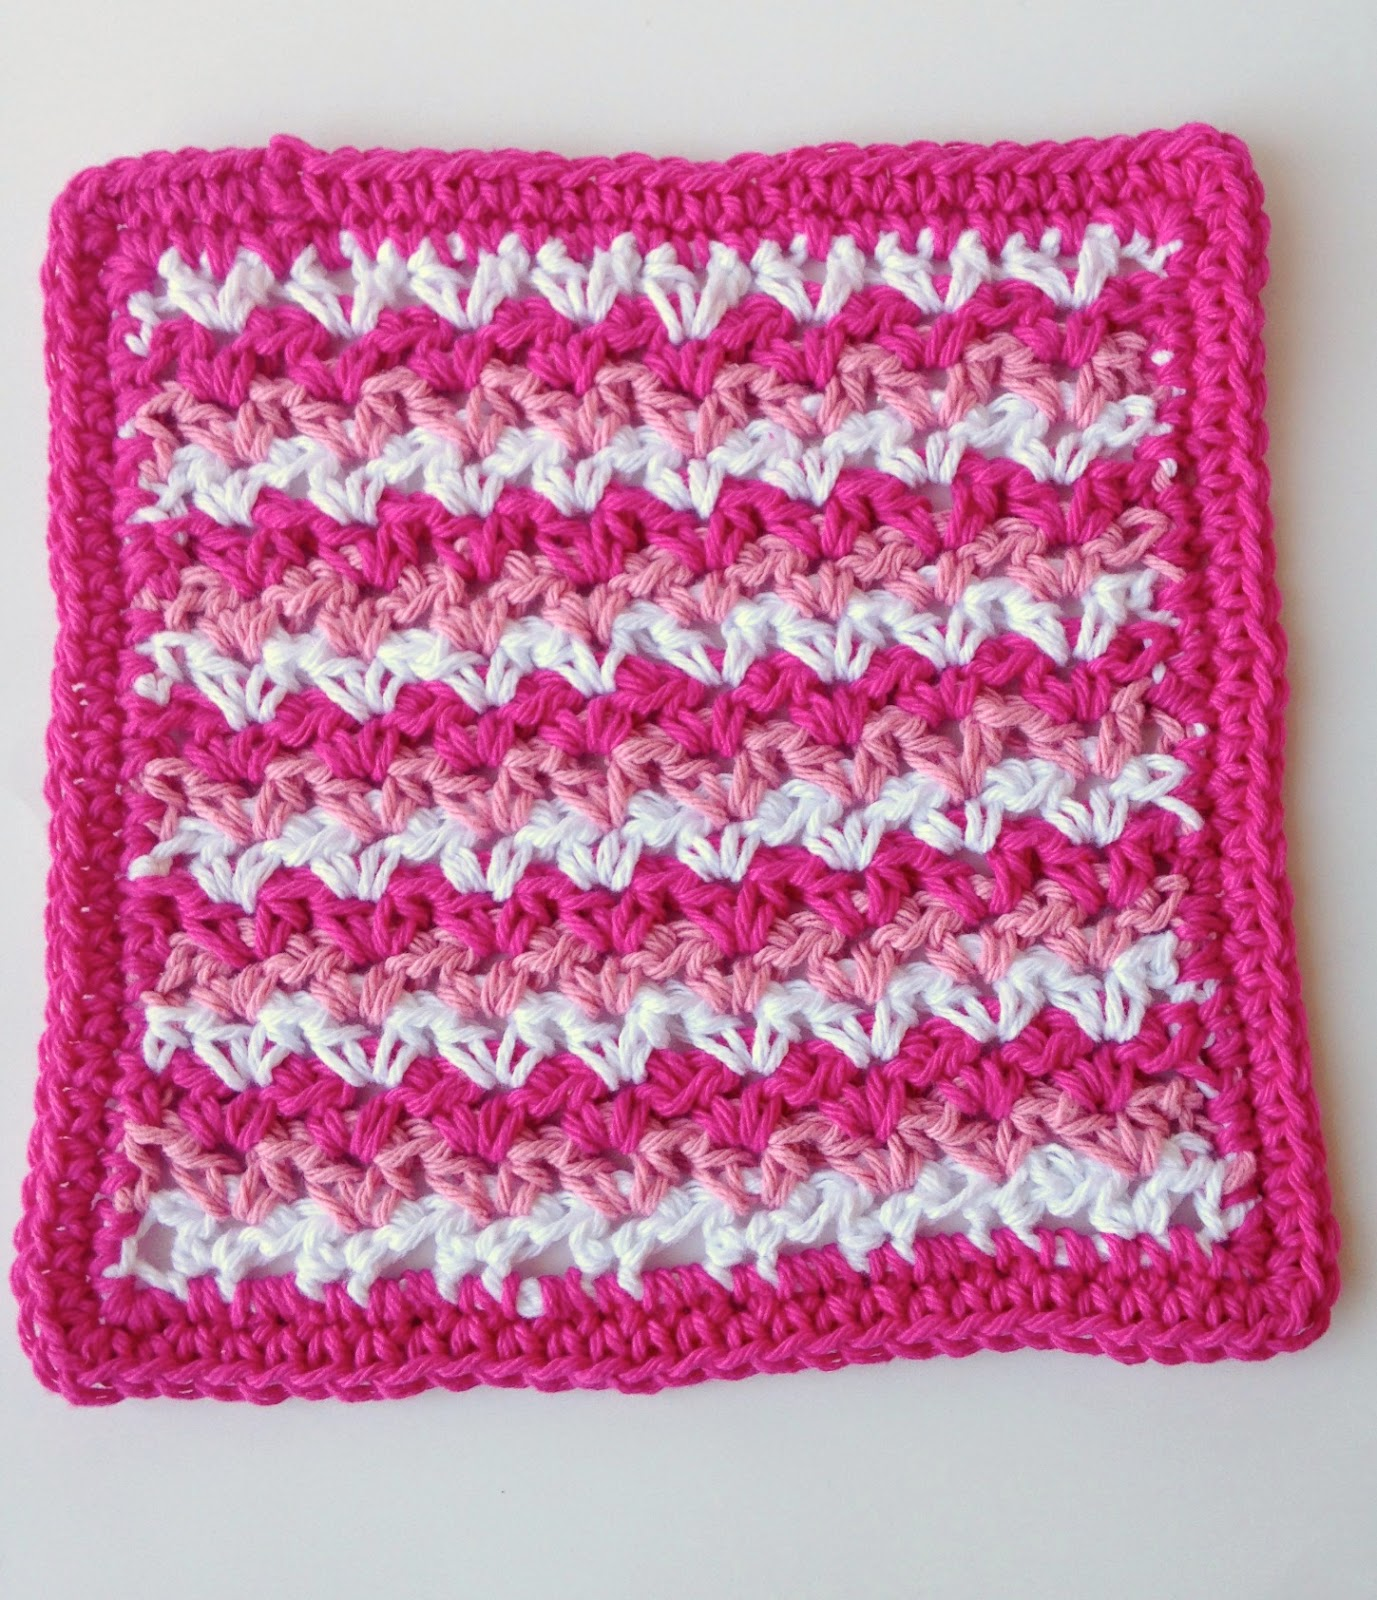 5 Little Monsters: Valentine Dishcloth Collection: #3 V-Day Stripes